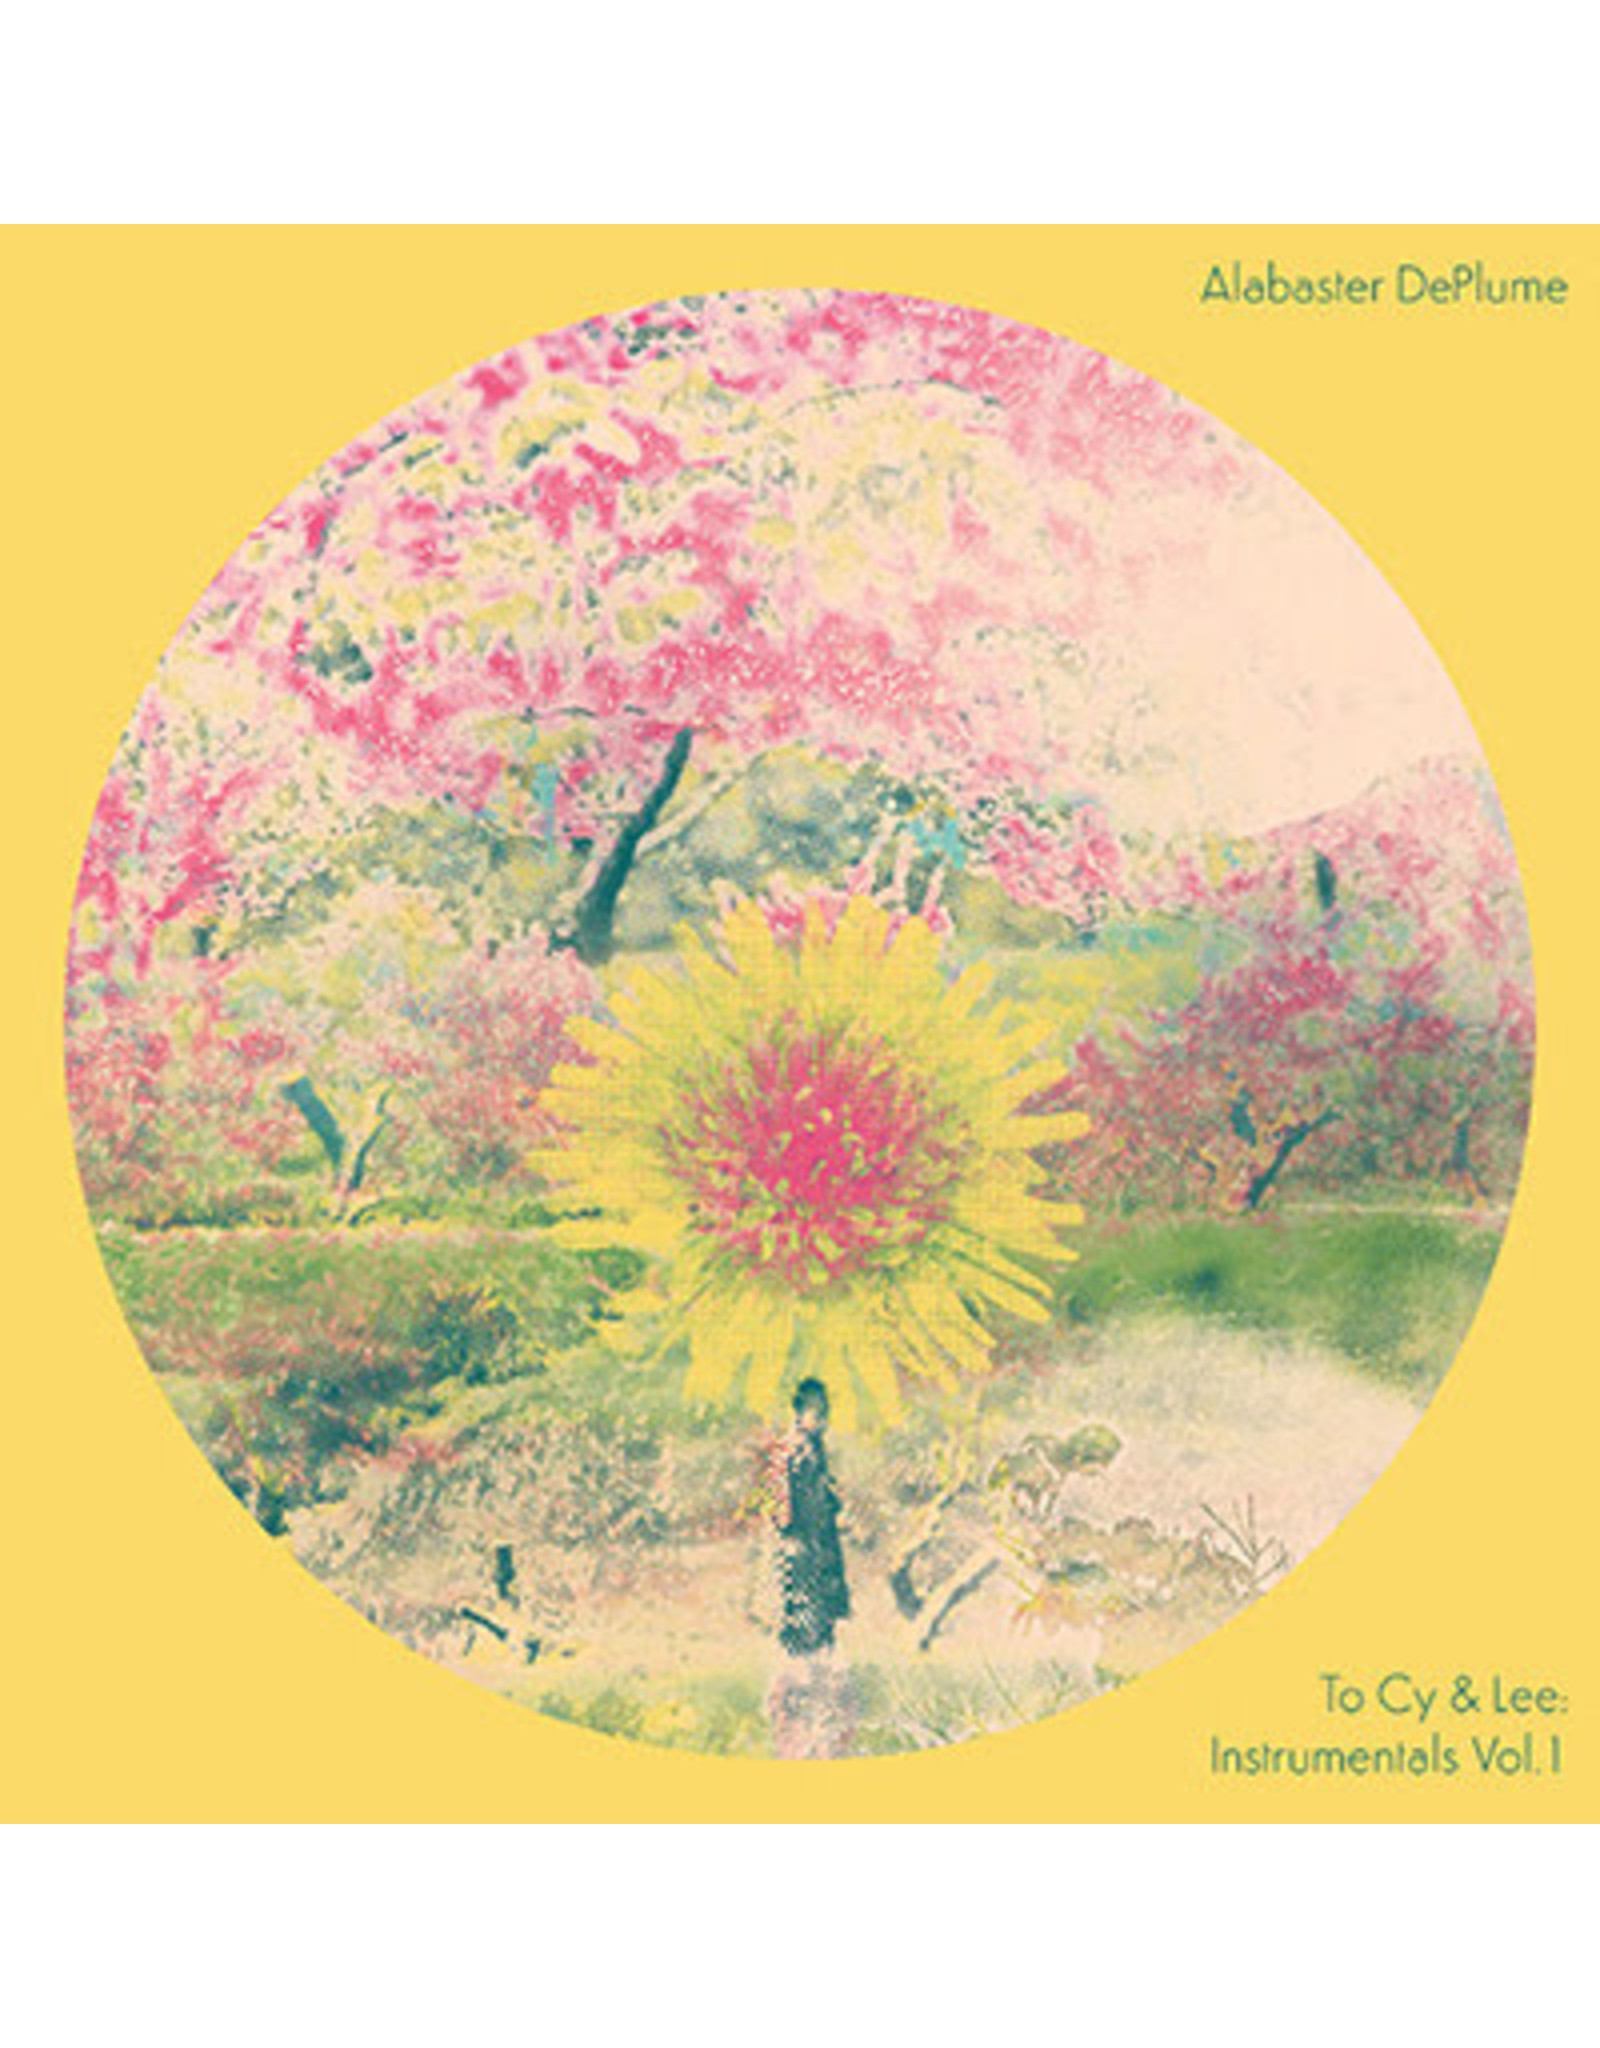 International Anthem DePlume, Alabaster: To Cy & Lee: Instrumentals Vol. 1 LP